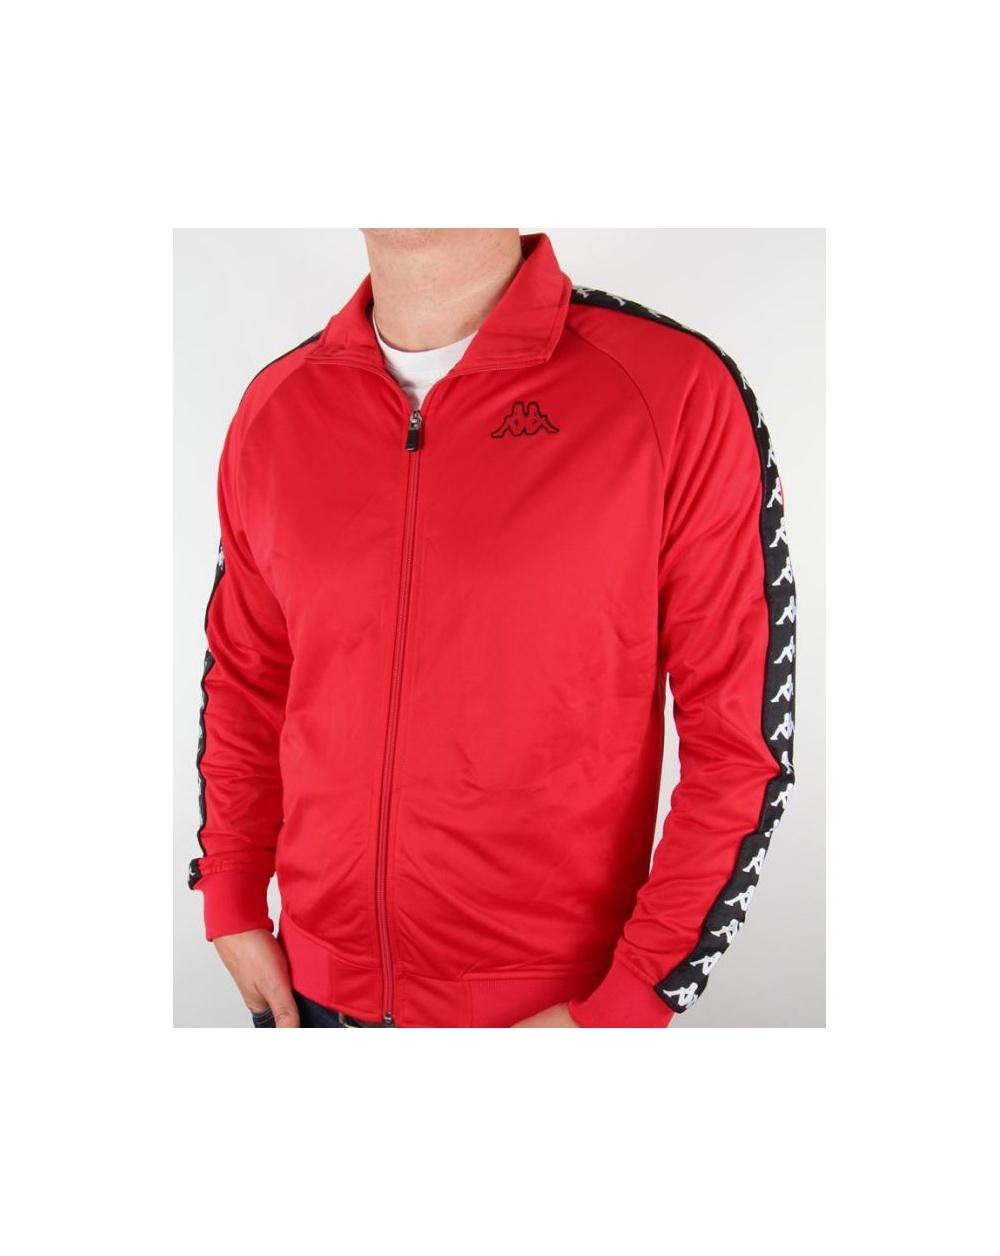 Robe Di Kappa Logo Track Top Red - kappa tracksuit top, orange